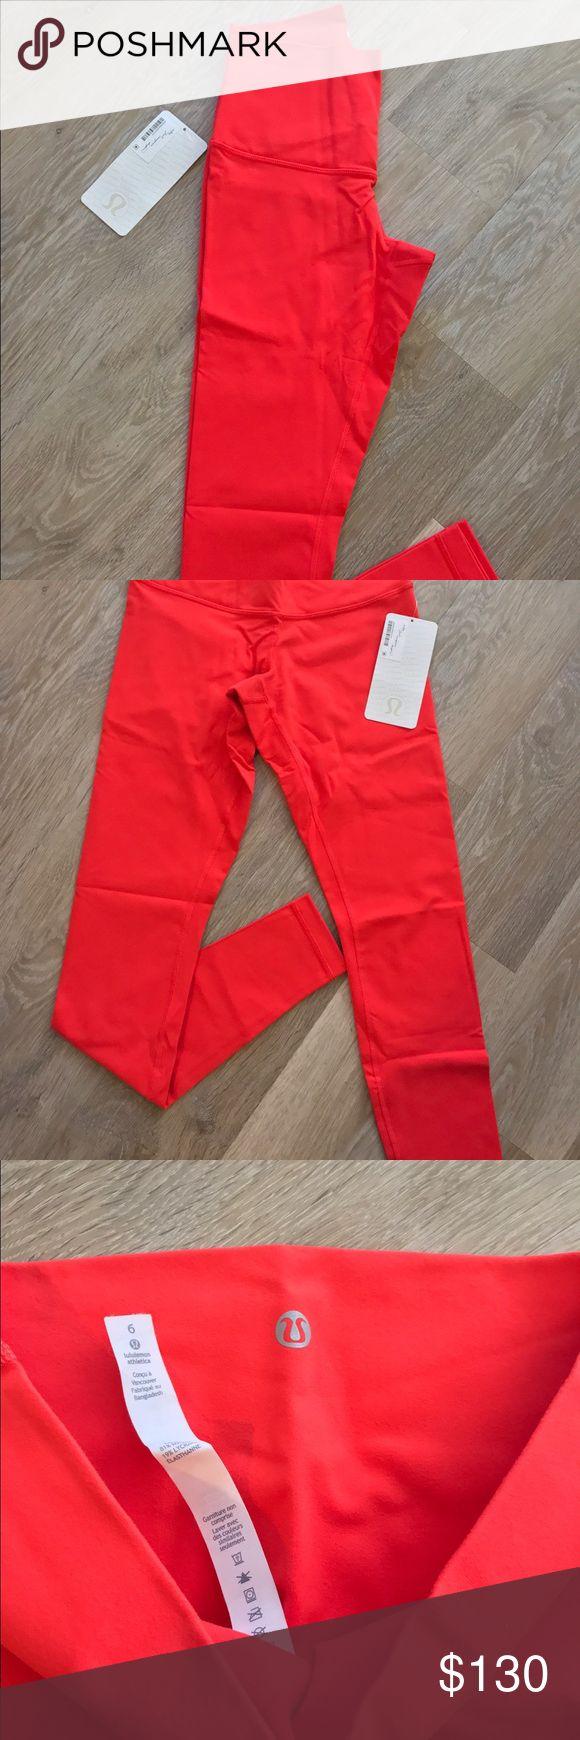 Lululemon Wunder Under Roll Down Pant Alarming Red Lululemon Wunder Under Roll Down Pant Alarming Red size 6  ALL SALES FINAL lululemon athletica Pants Leggings